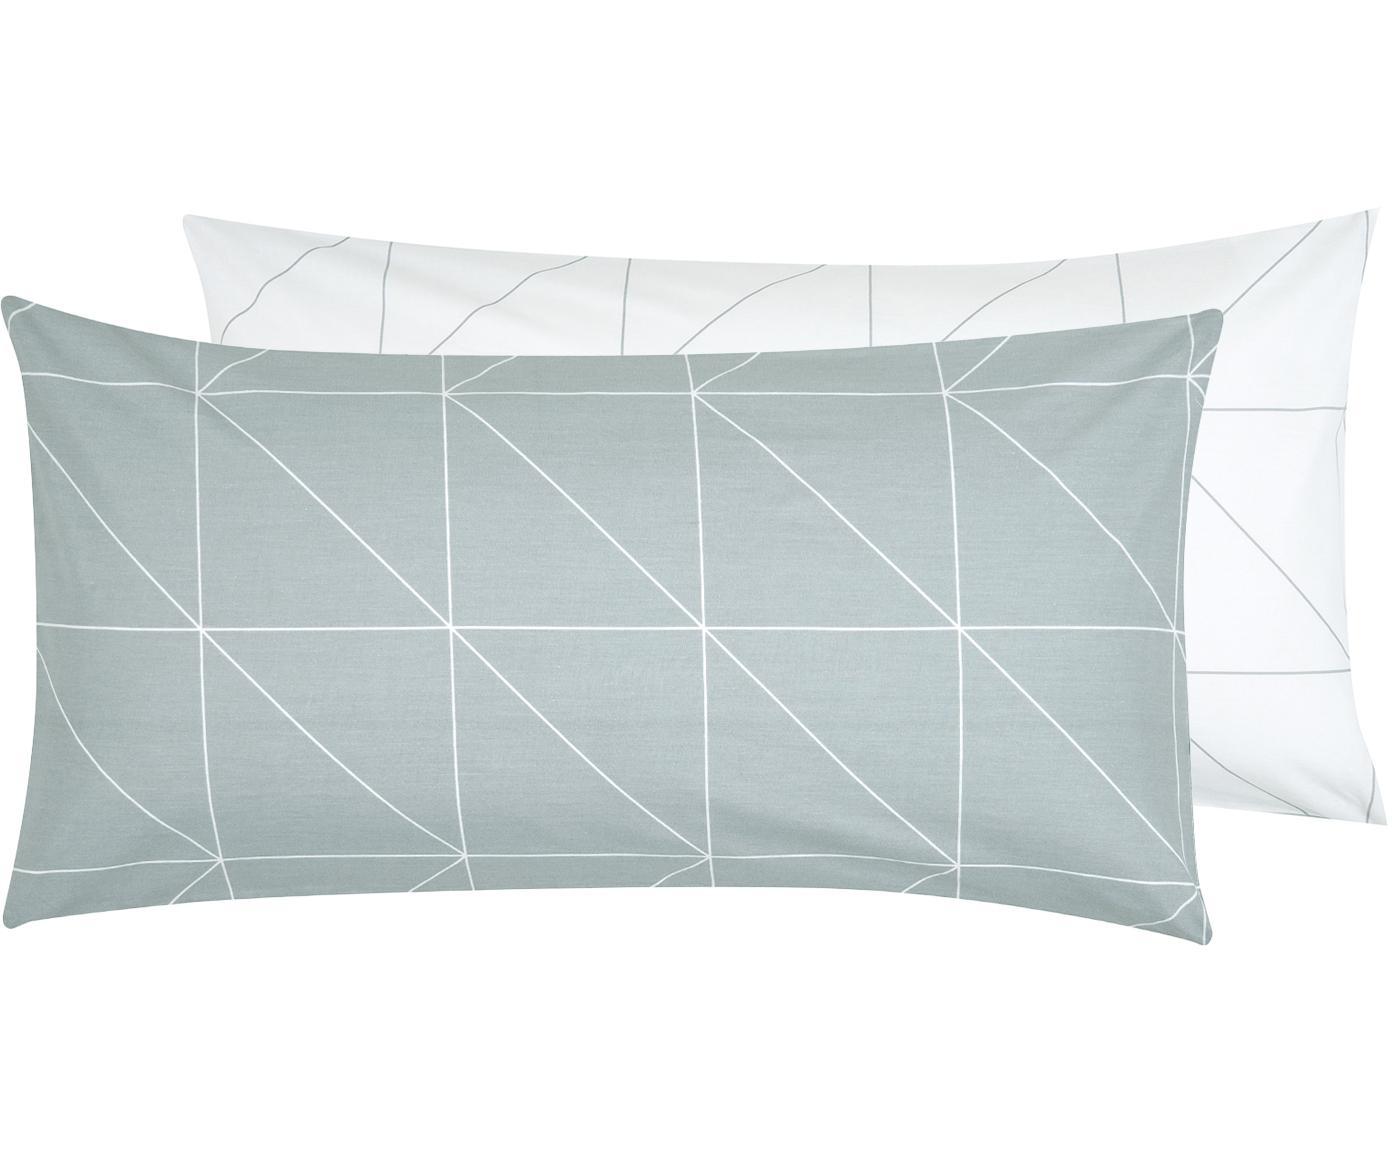 Dwustronna poszewka na poduszkę z bawełny renforcé Marla, 2 szt., Szary, biały, S 40 x D 80 cm